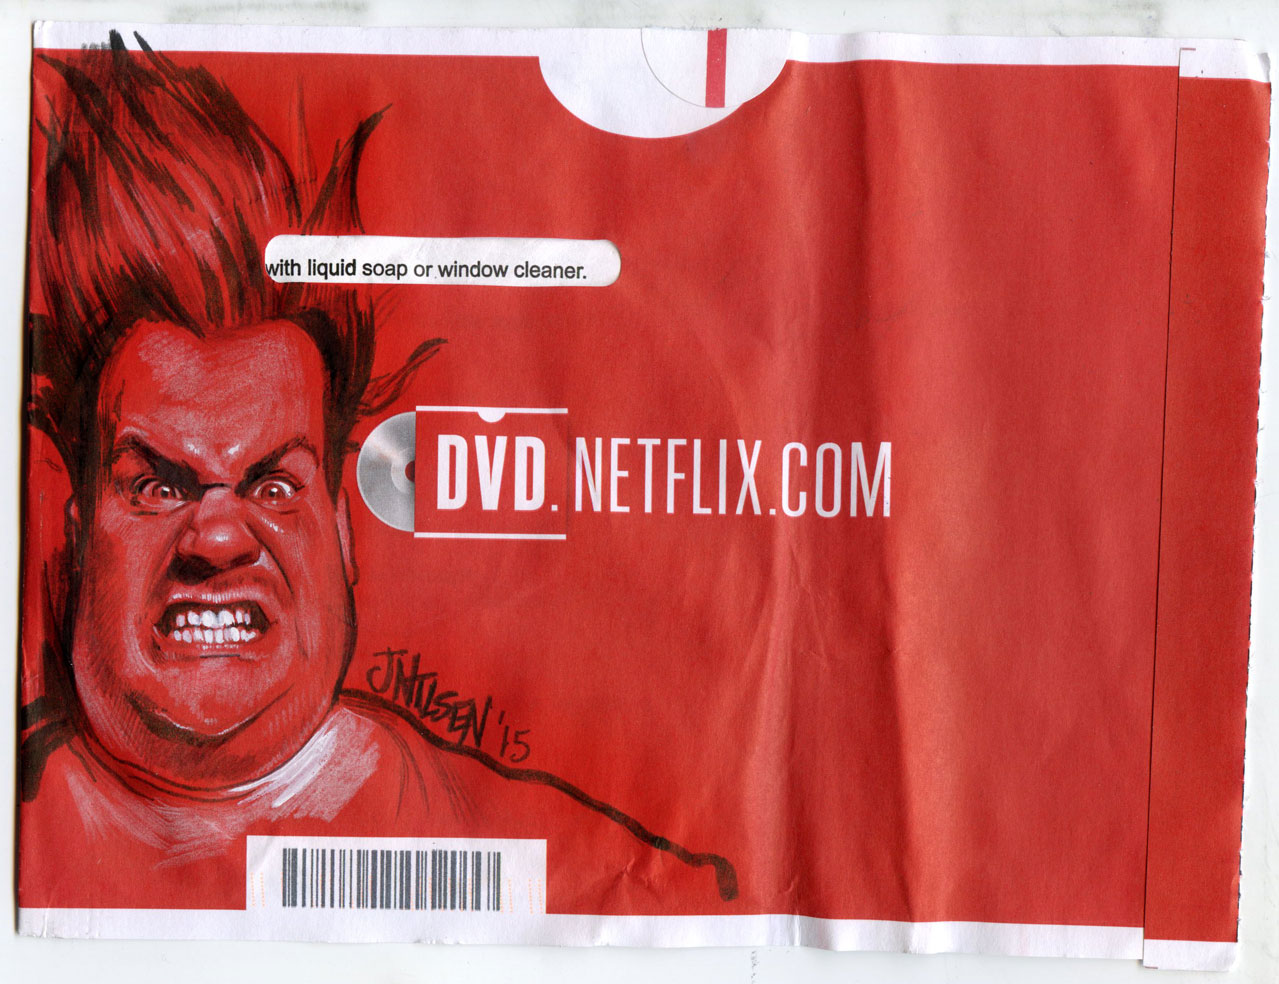 07-Netflix-ChrisFarley.jpg